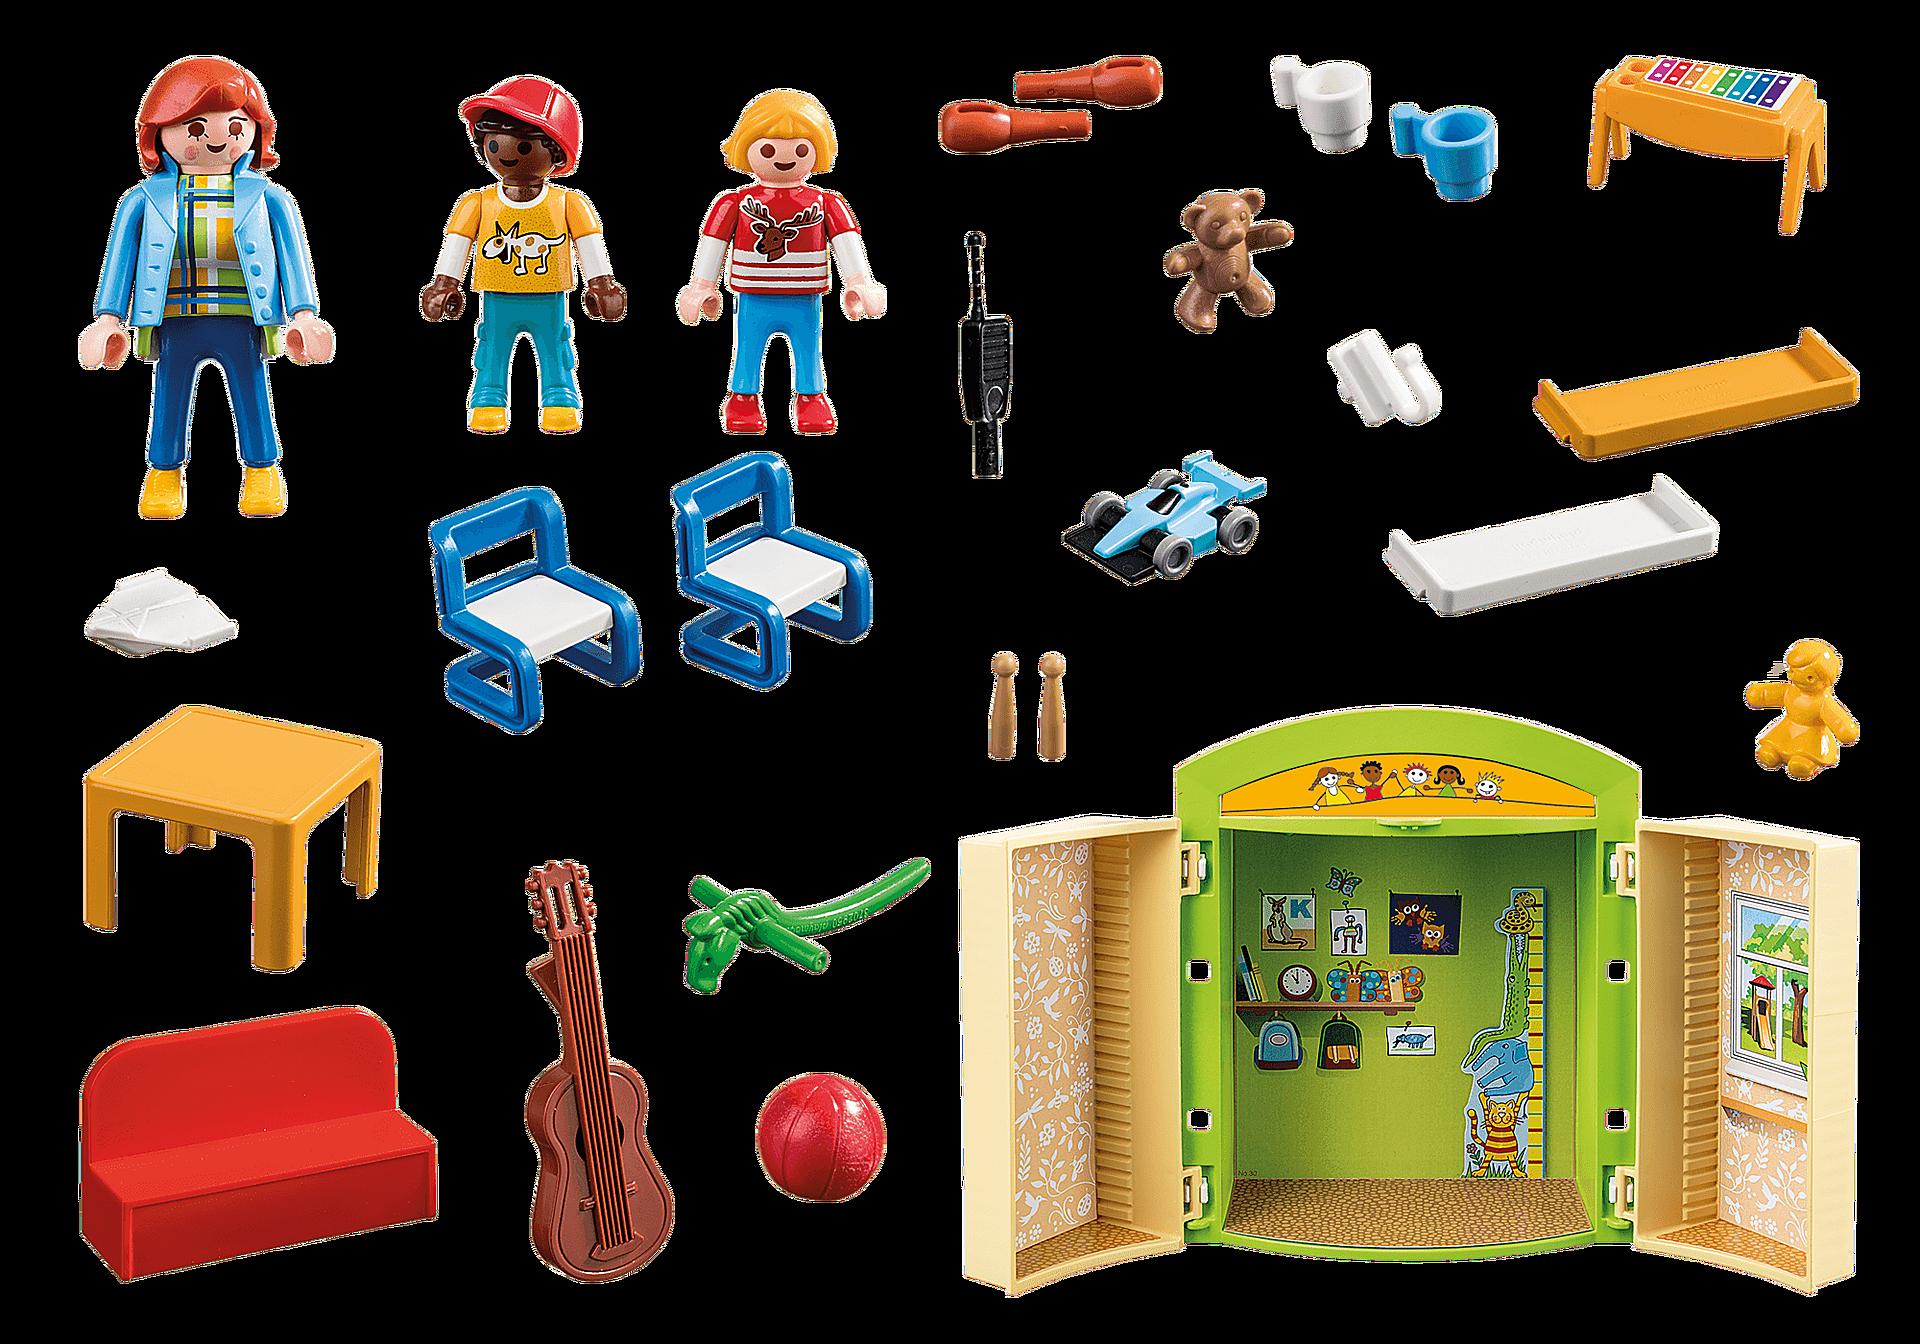 70308 Speelbox Kinderdagverblijf zoom image3